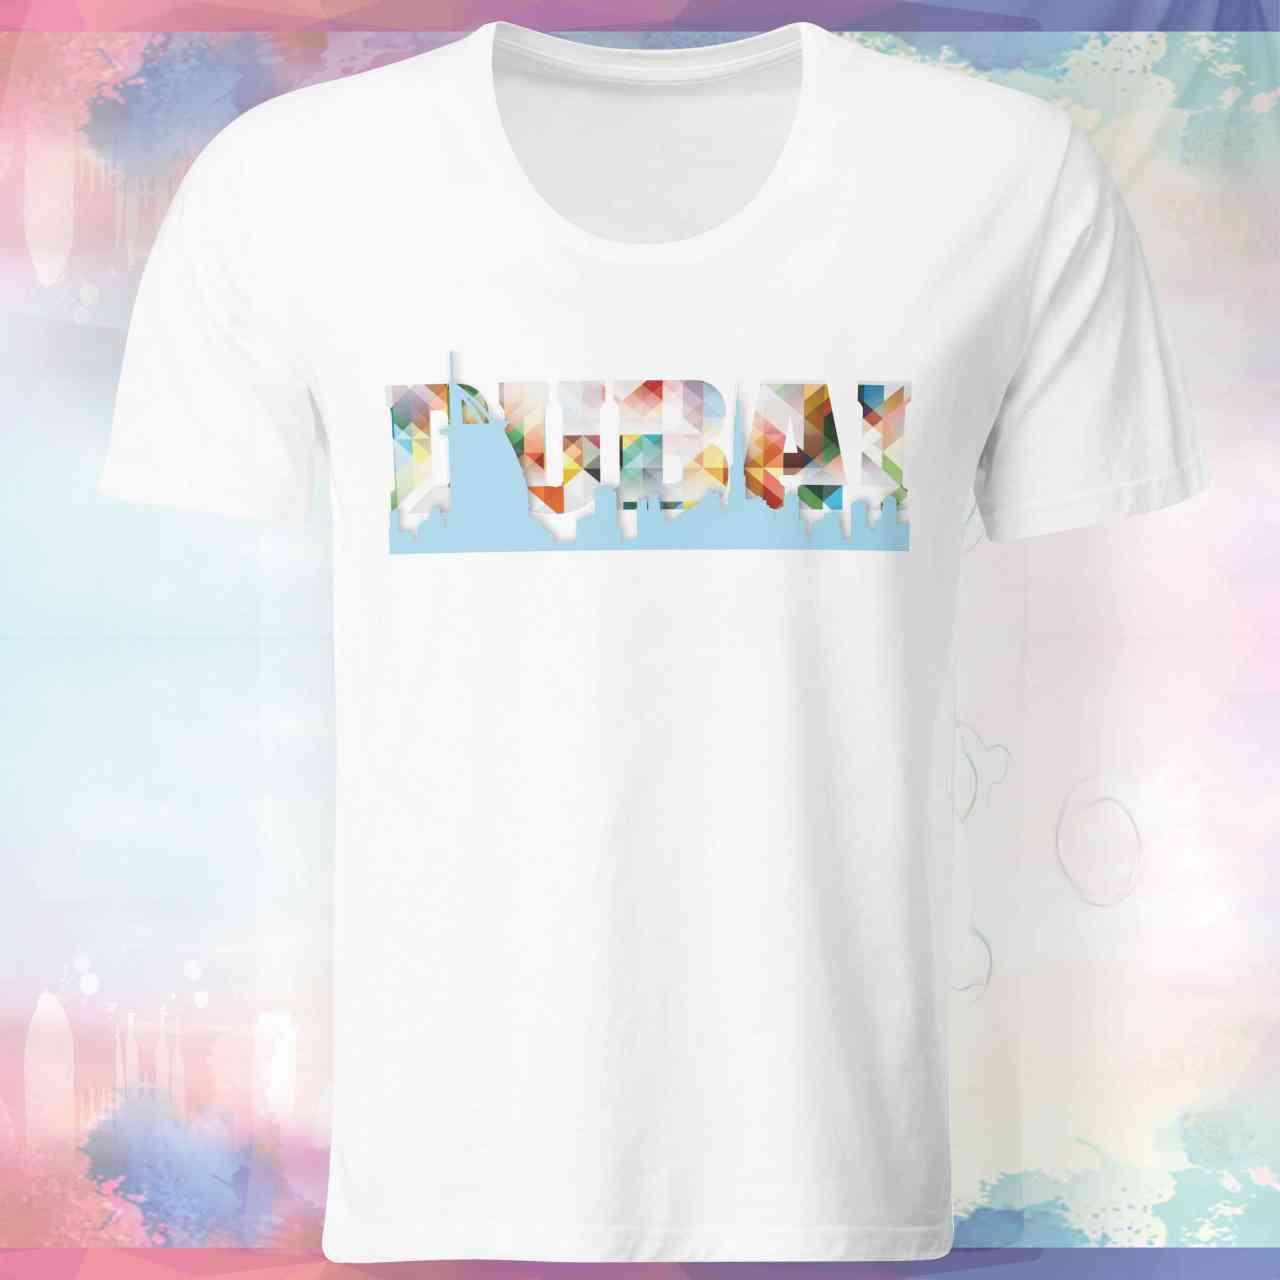 Dubai Skyline Shirt | Dubai Skyline T-Shirt | Dubau Skyline Tshirt